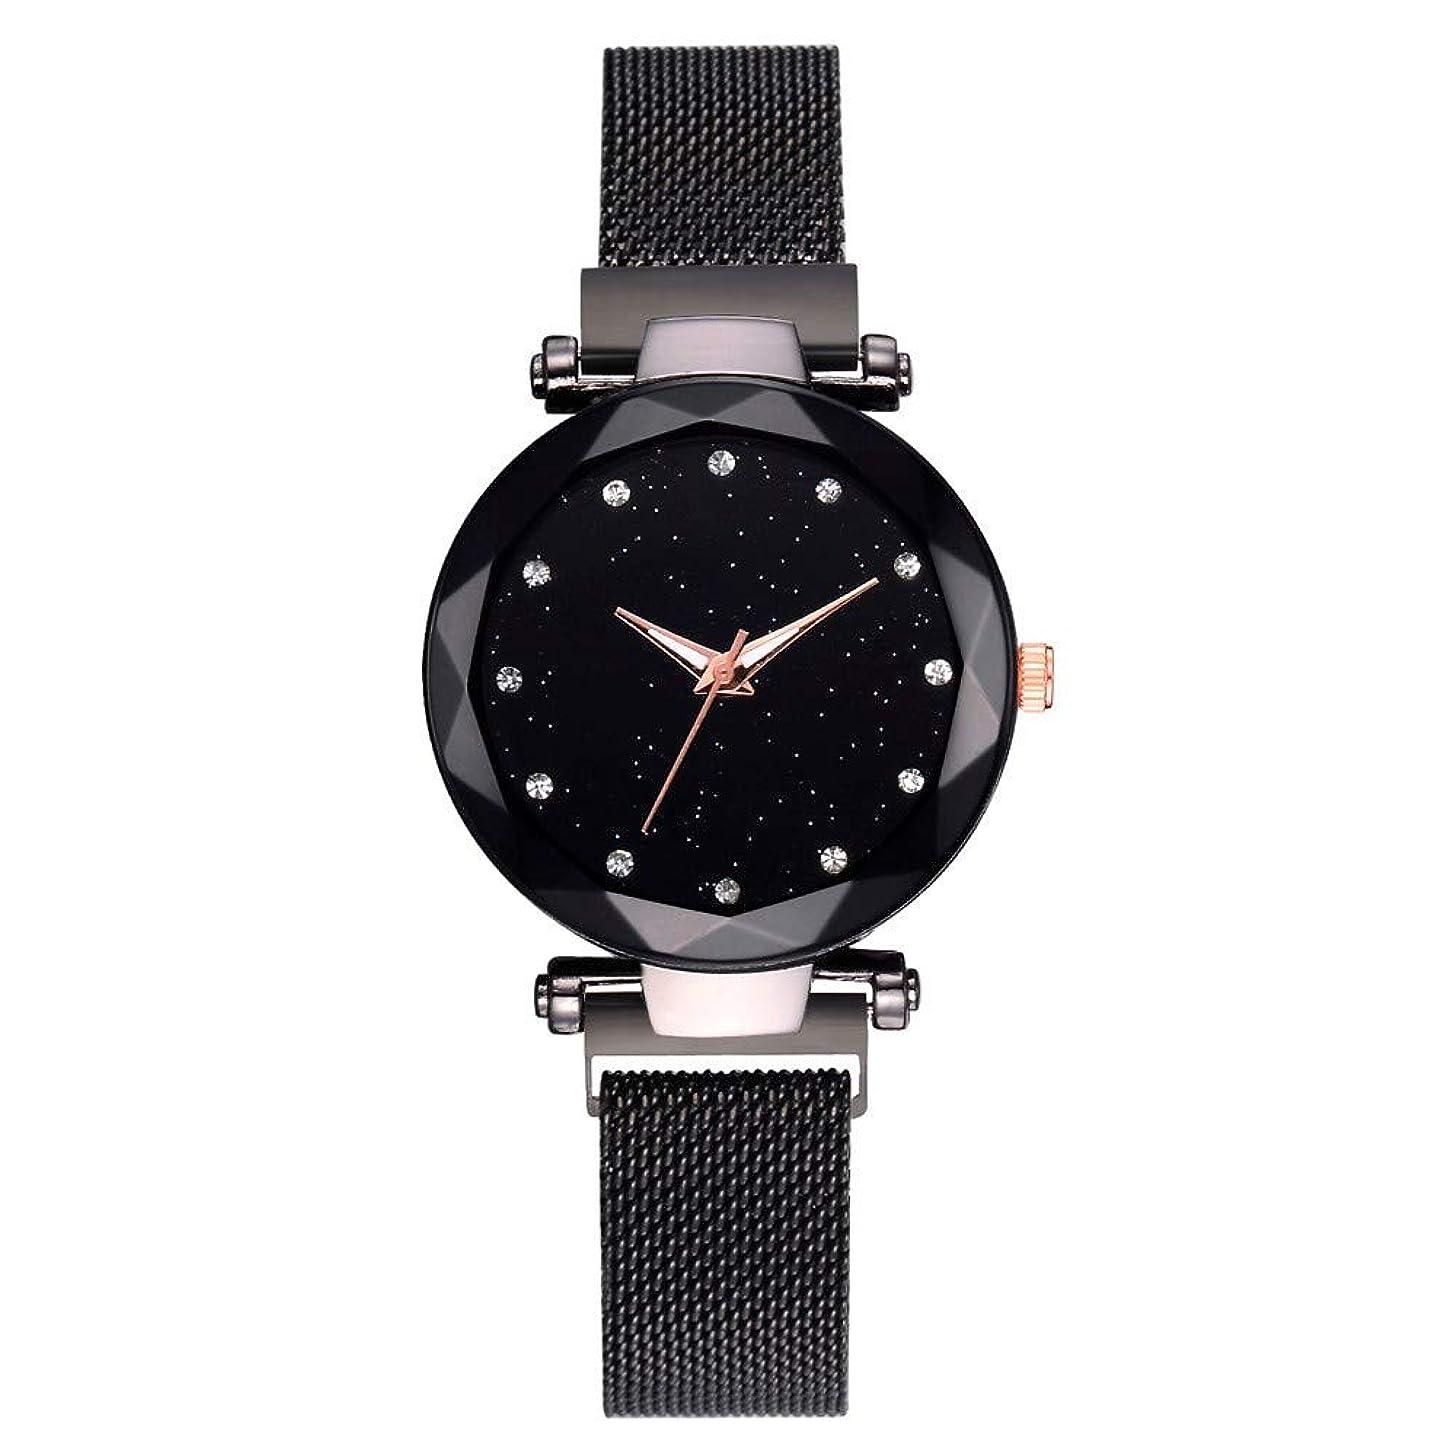 LUCA Womens Watches Fashion Simple Minimalist Quartz Analog Watch Designer Luxury Business Classic Dress Wrist Watch